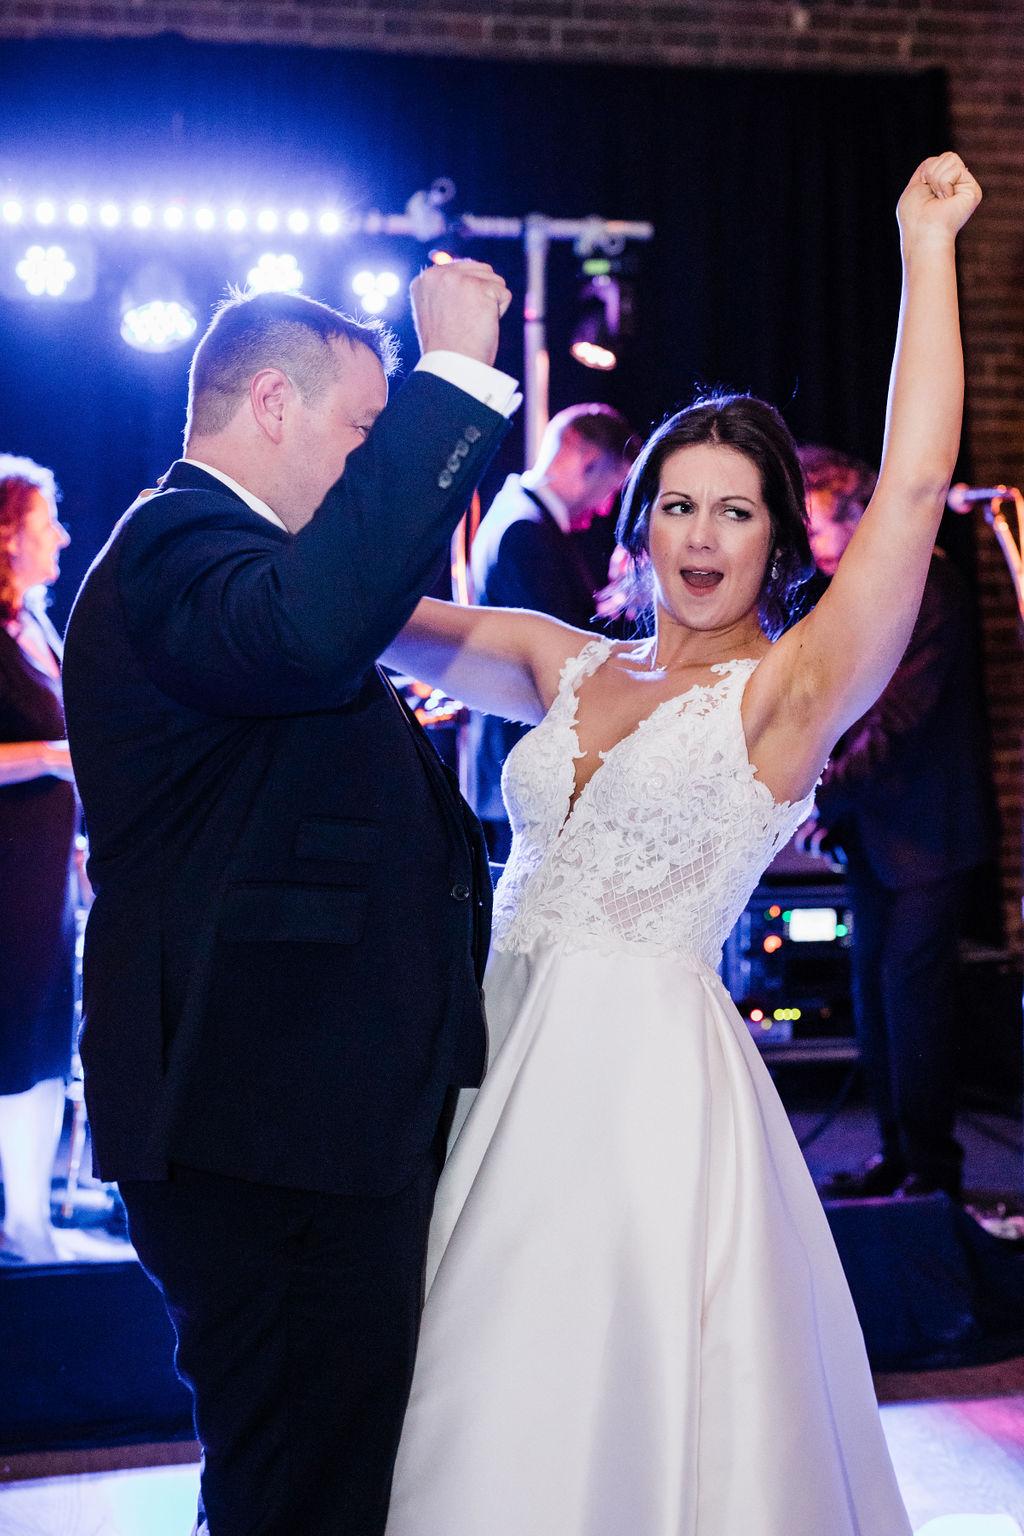 Your_Wedding_Day_617.jpg